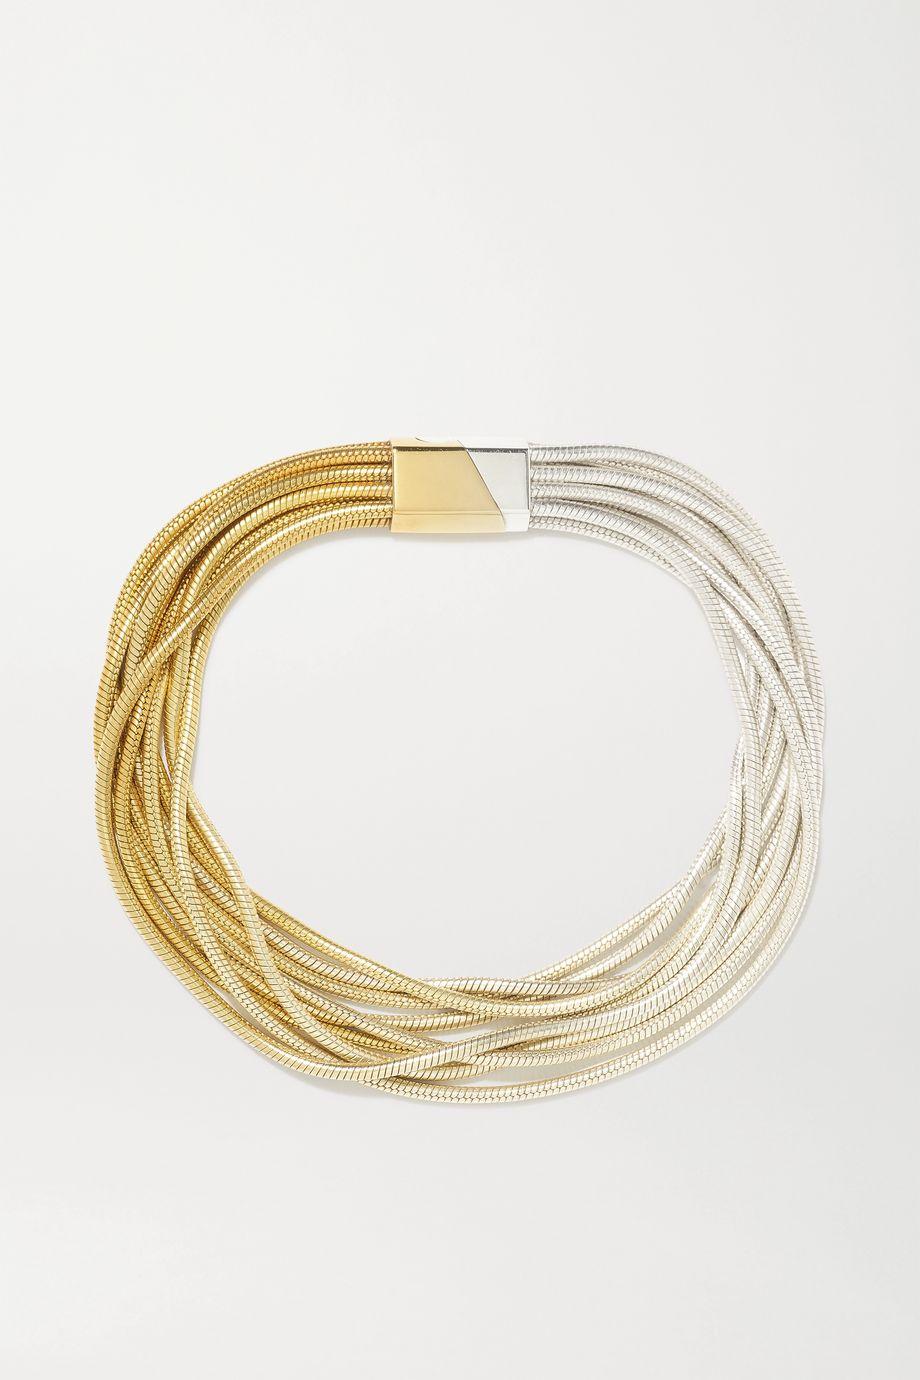 SARAH & SEBASTIAN Feeler gold vermeil and silver bracelet